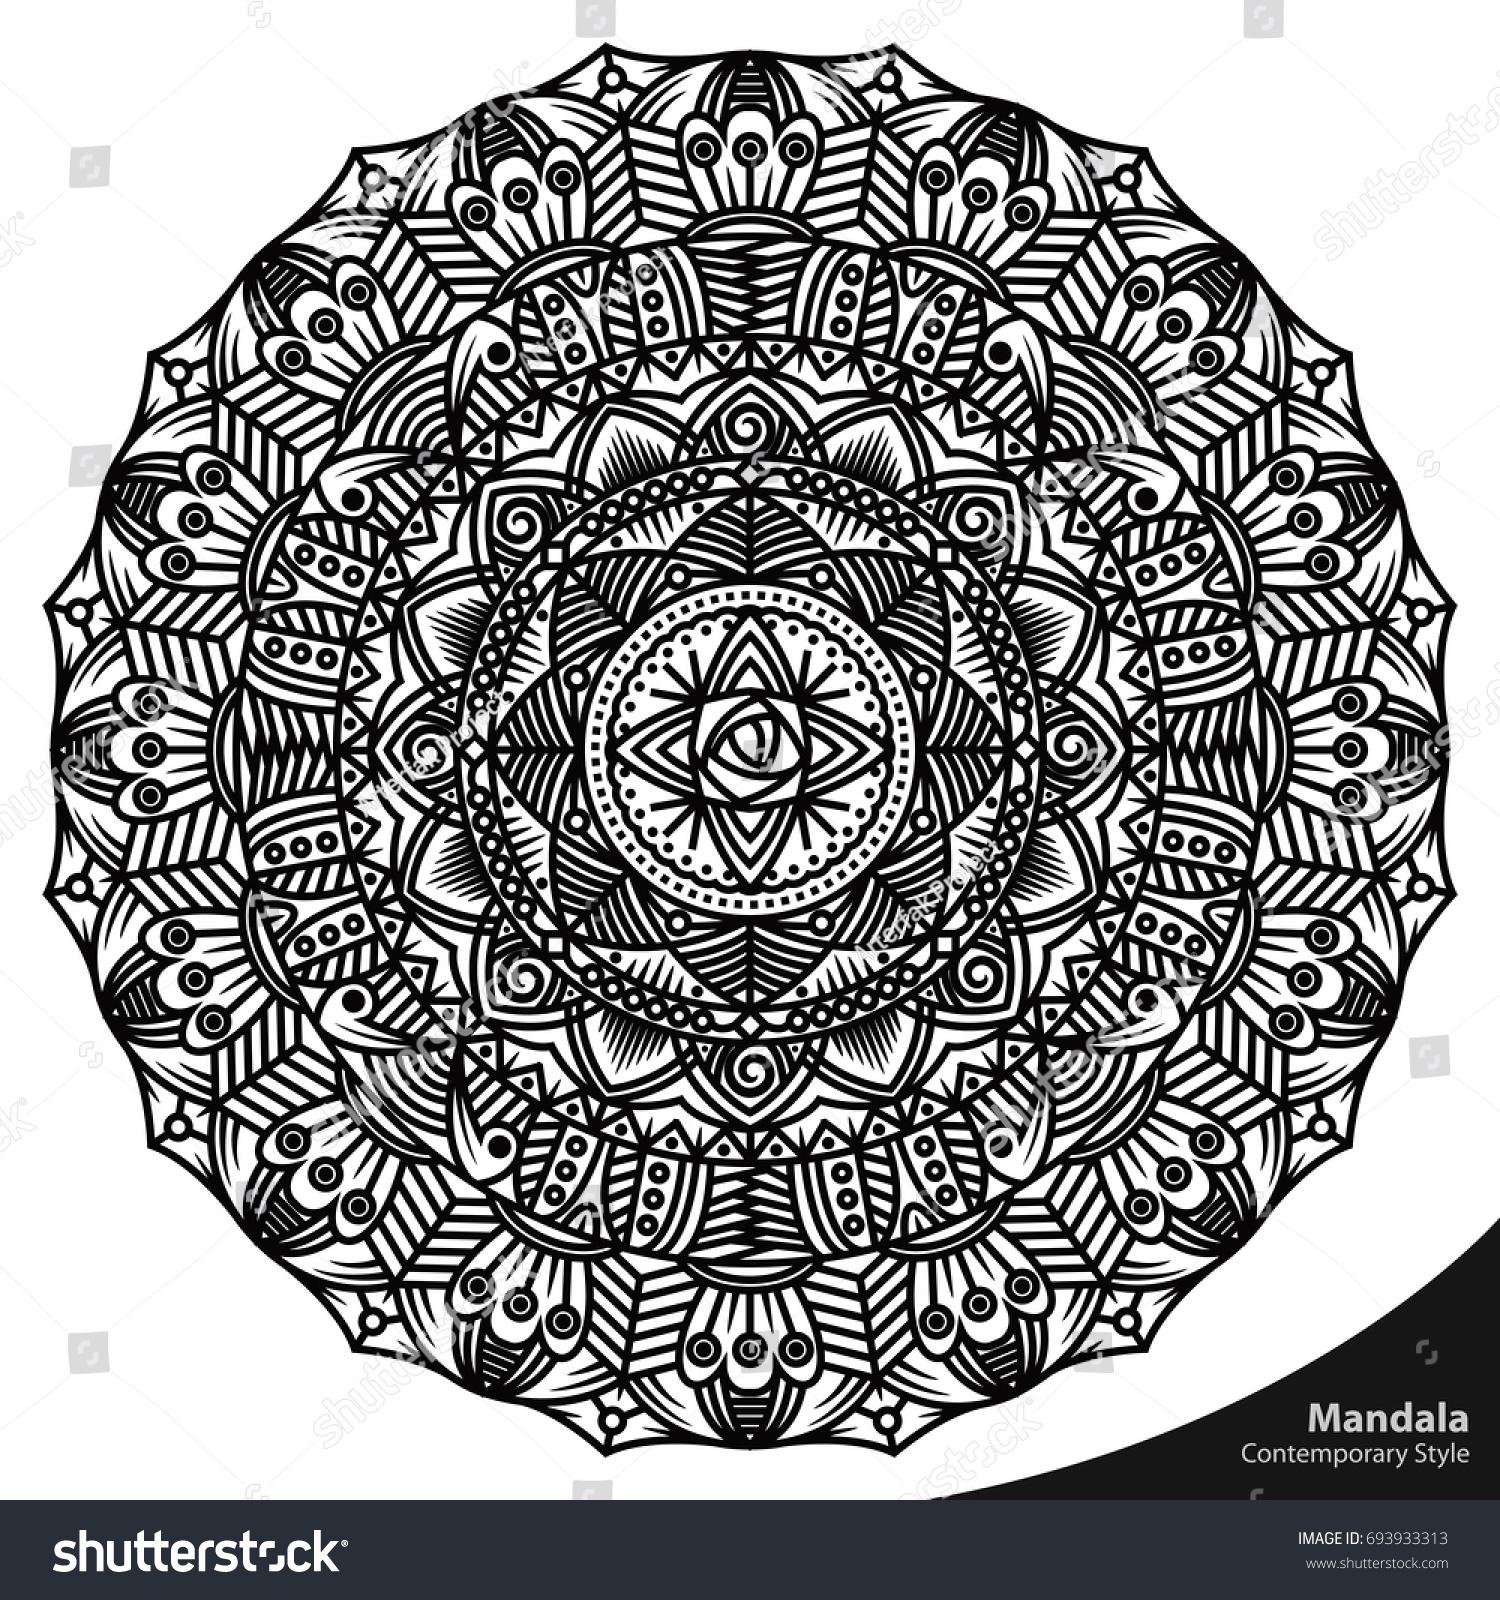 Mandala Worksheet Elements Of Art